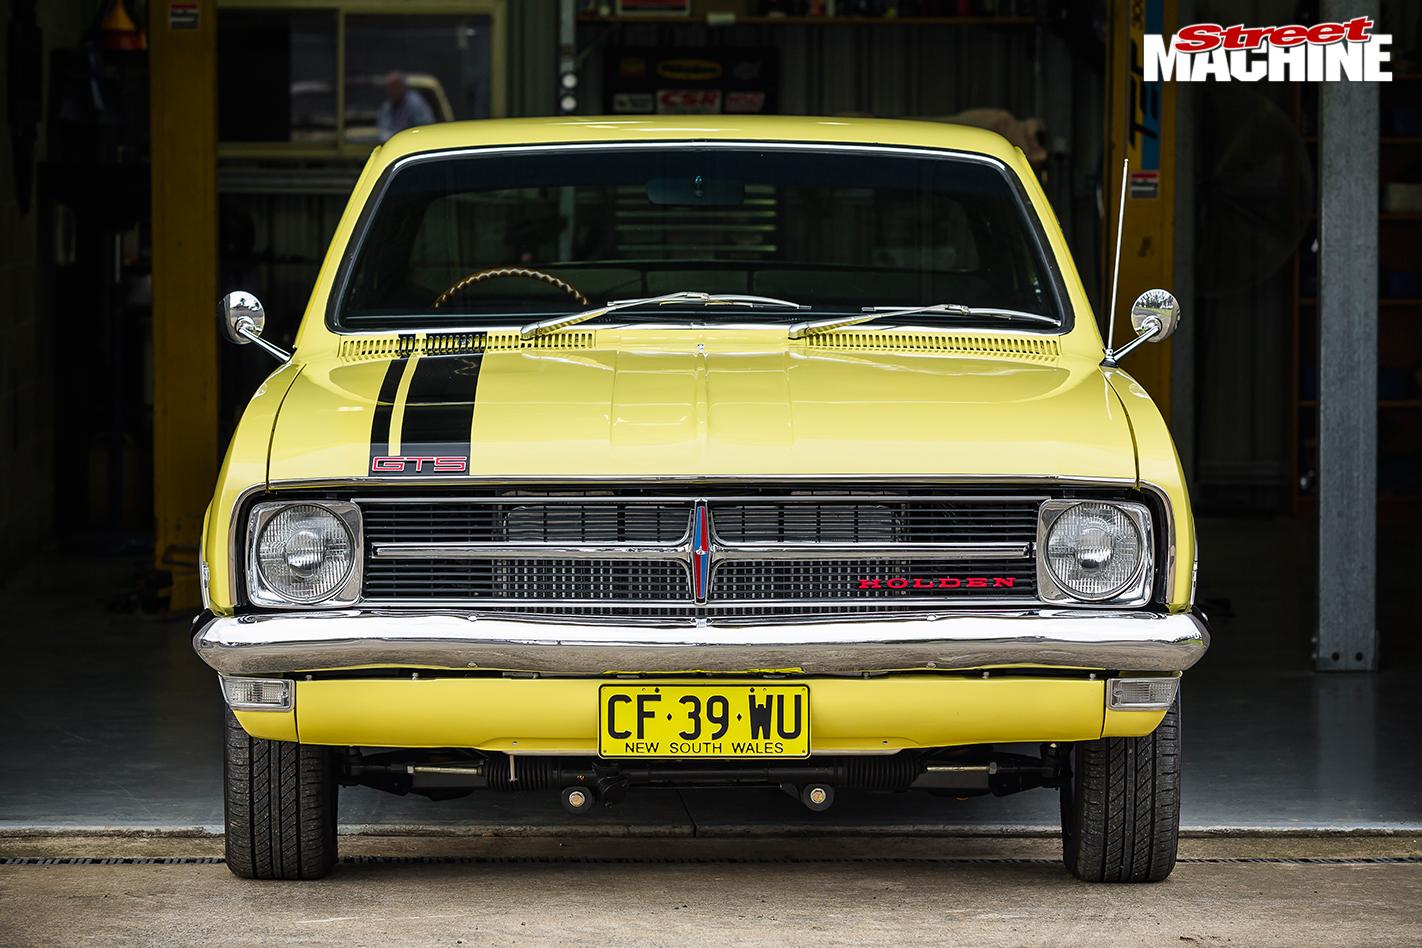 Holden -hk -monaro -front -view -2